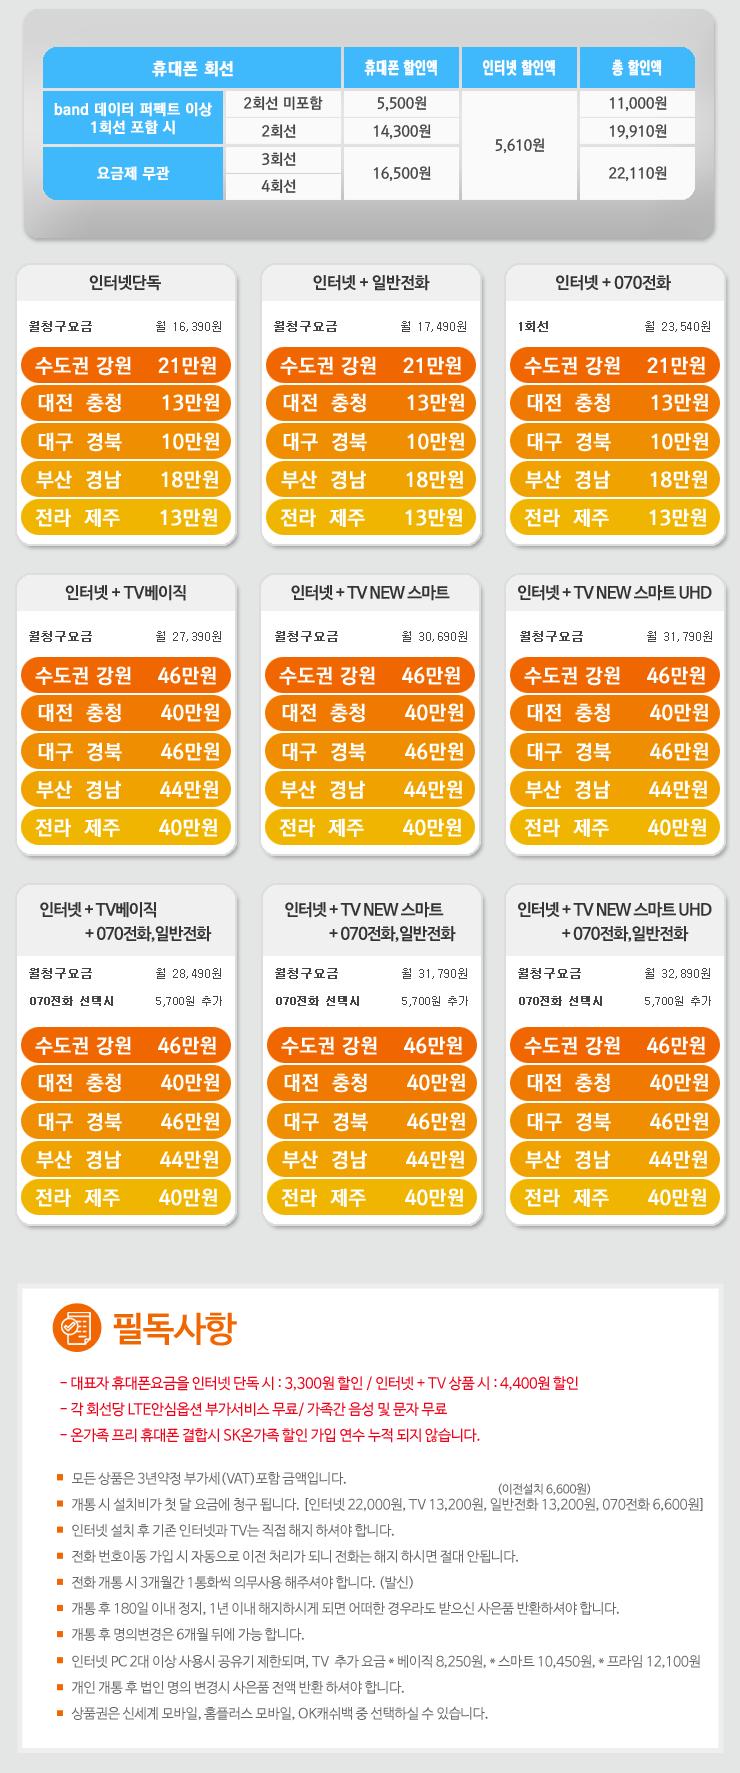 SK_broadband_plan_100m_740.png